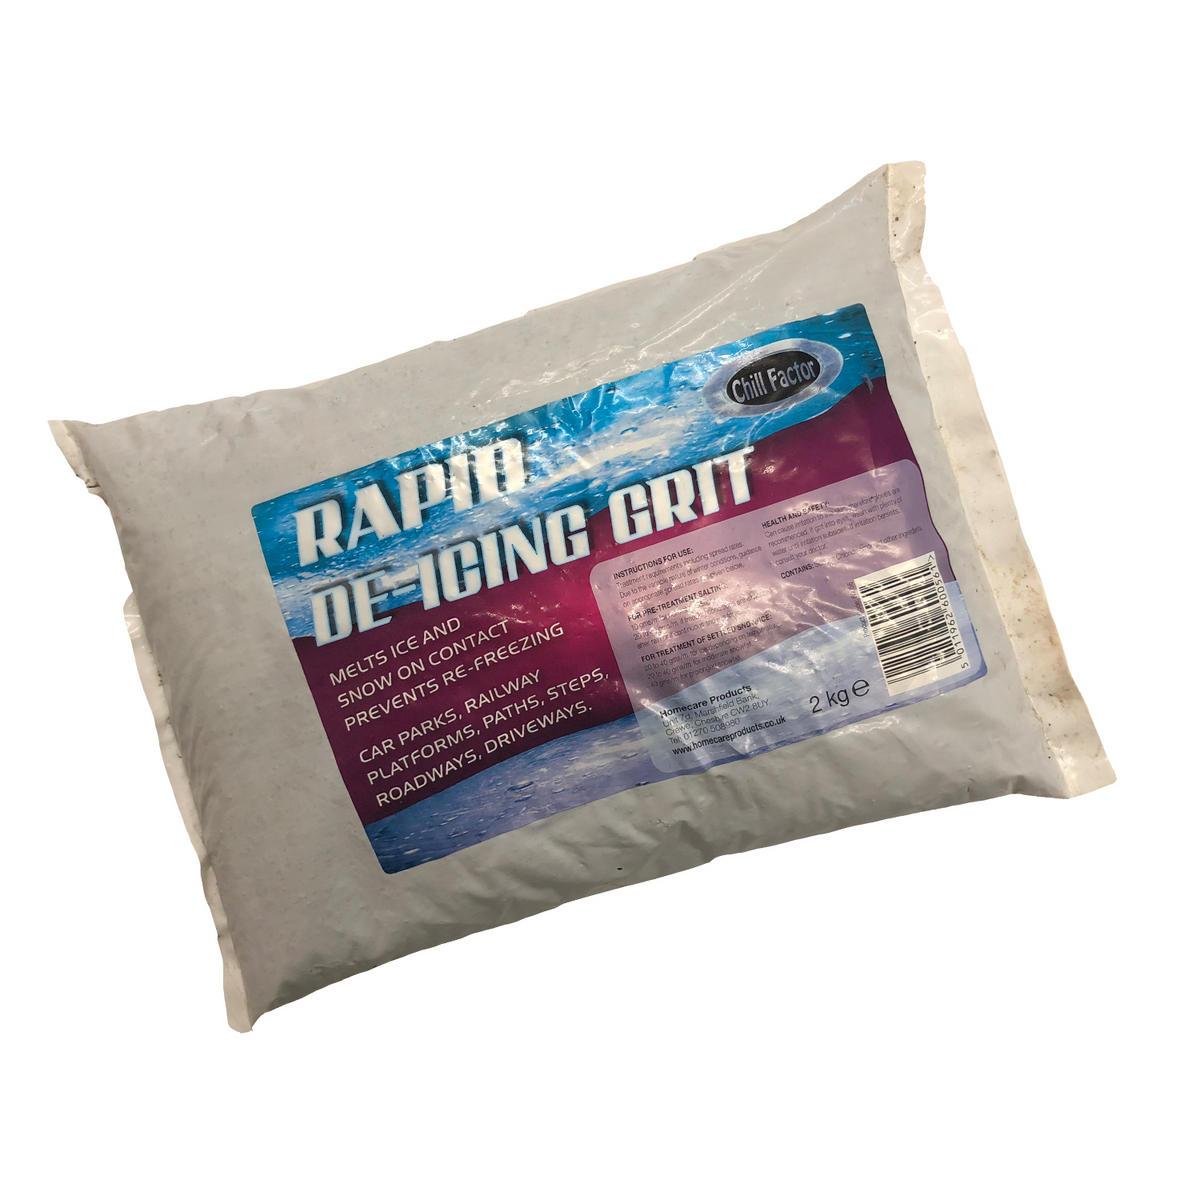 Rock Salt Ice Snow Fast Acting Melting Chill Factor Grit 2kg Kilo Bag